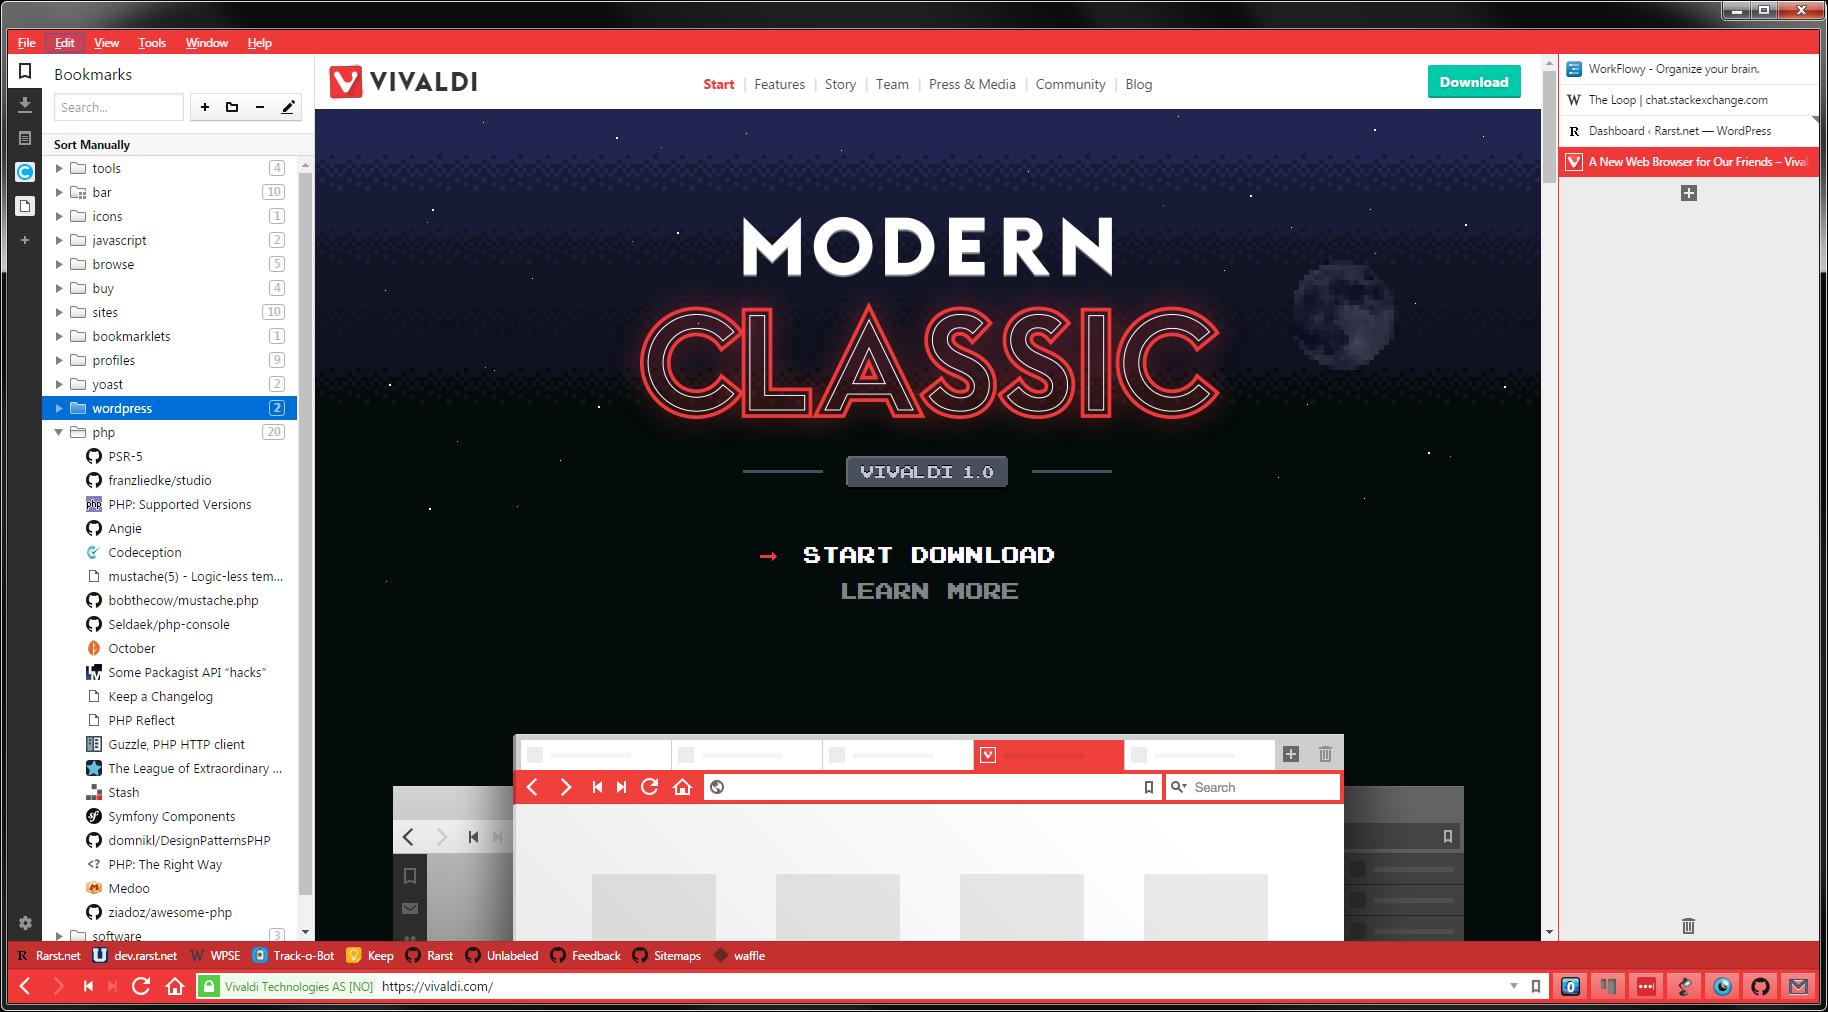 Vivaldi browser interface.